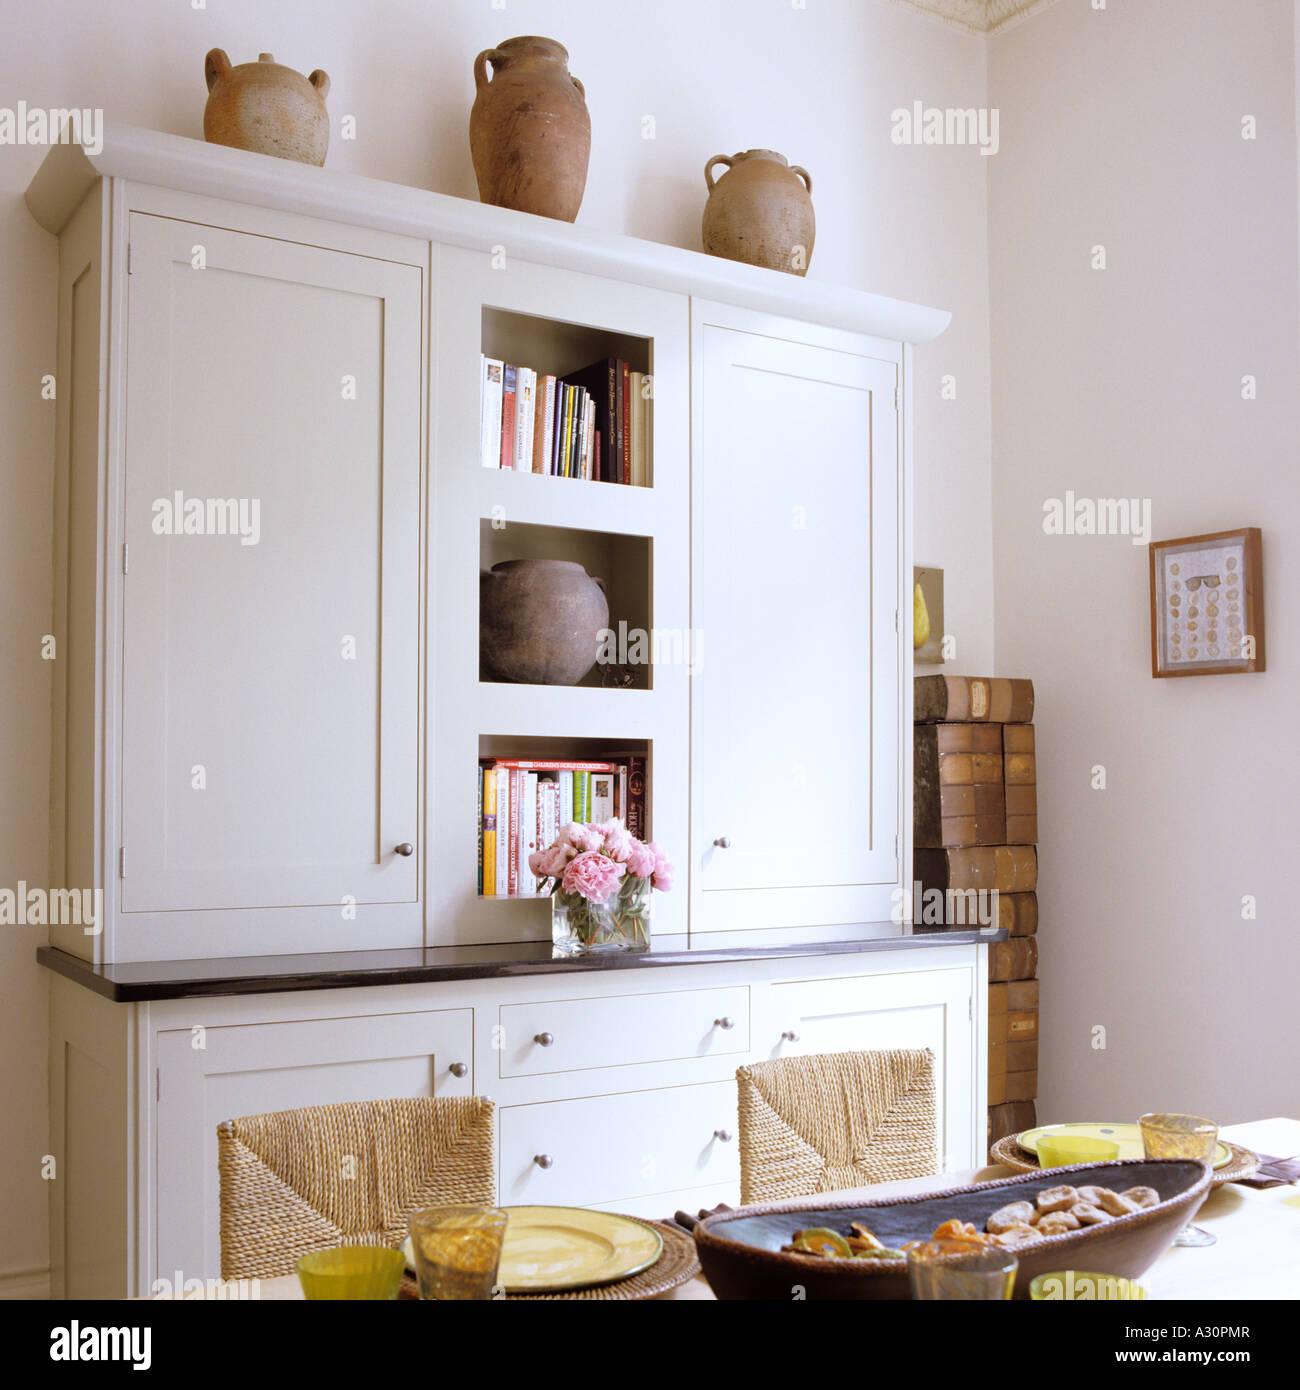 Interiors Furniture Kitchen Dresser Stock Photos & Interiors ...